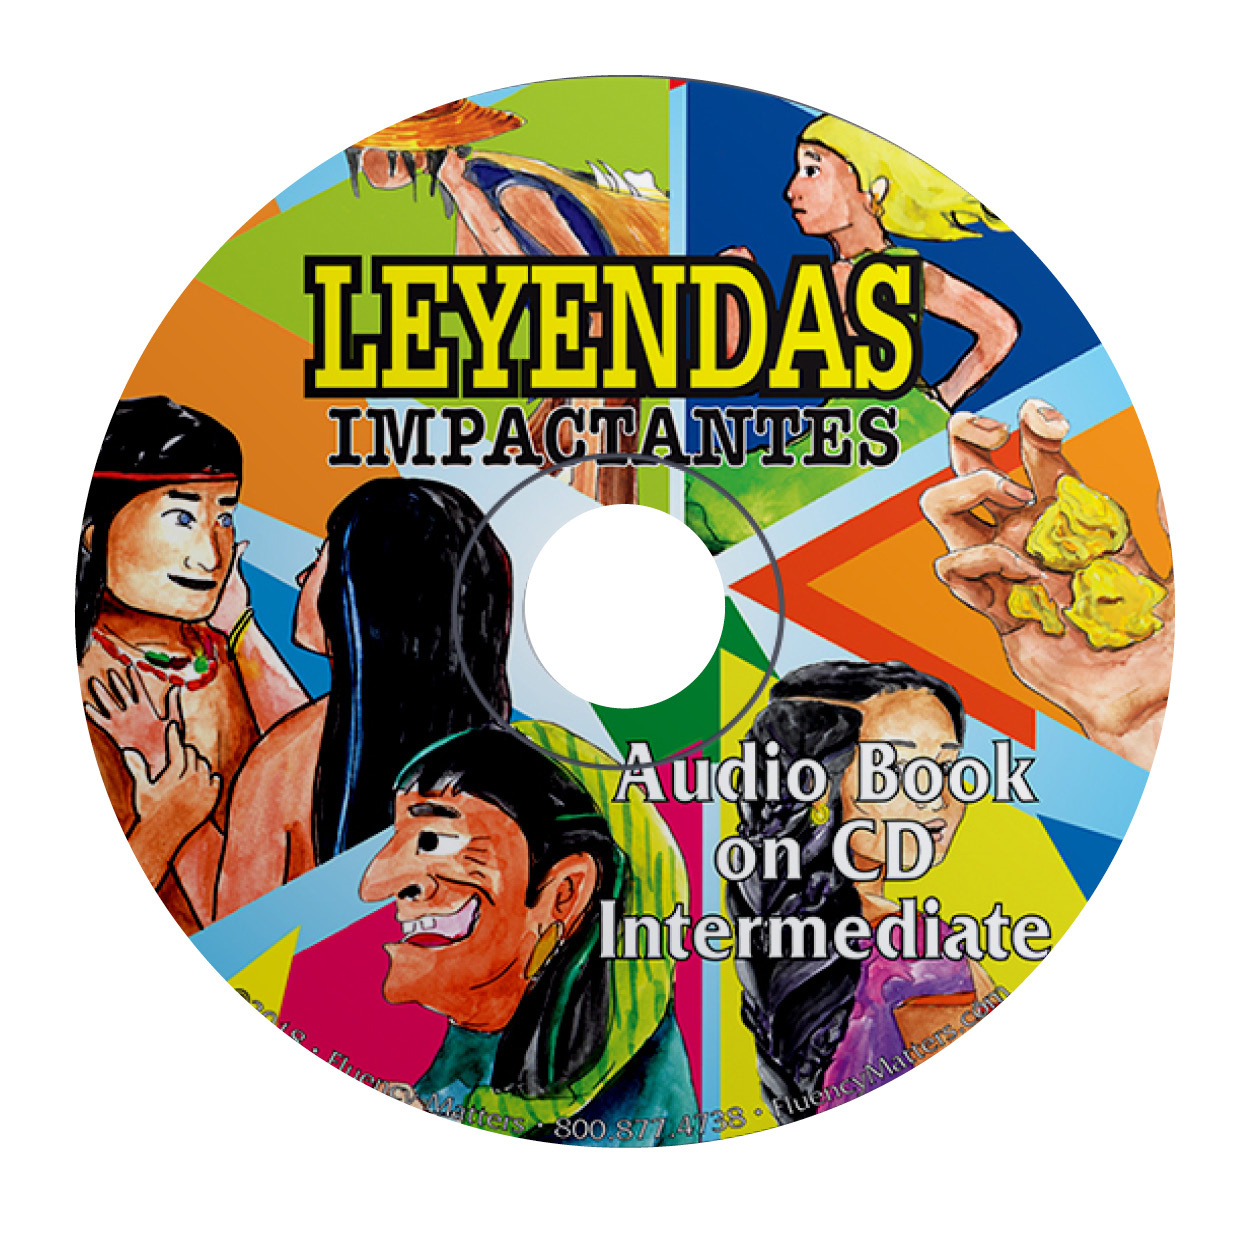 Leyendas impactantes - Audio Book